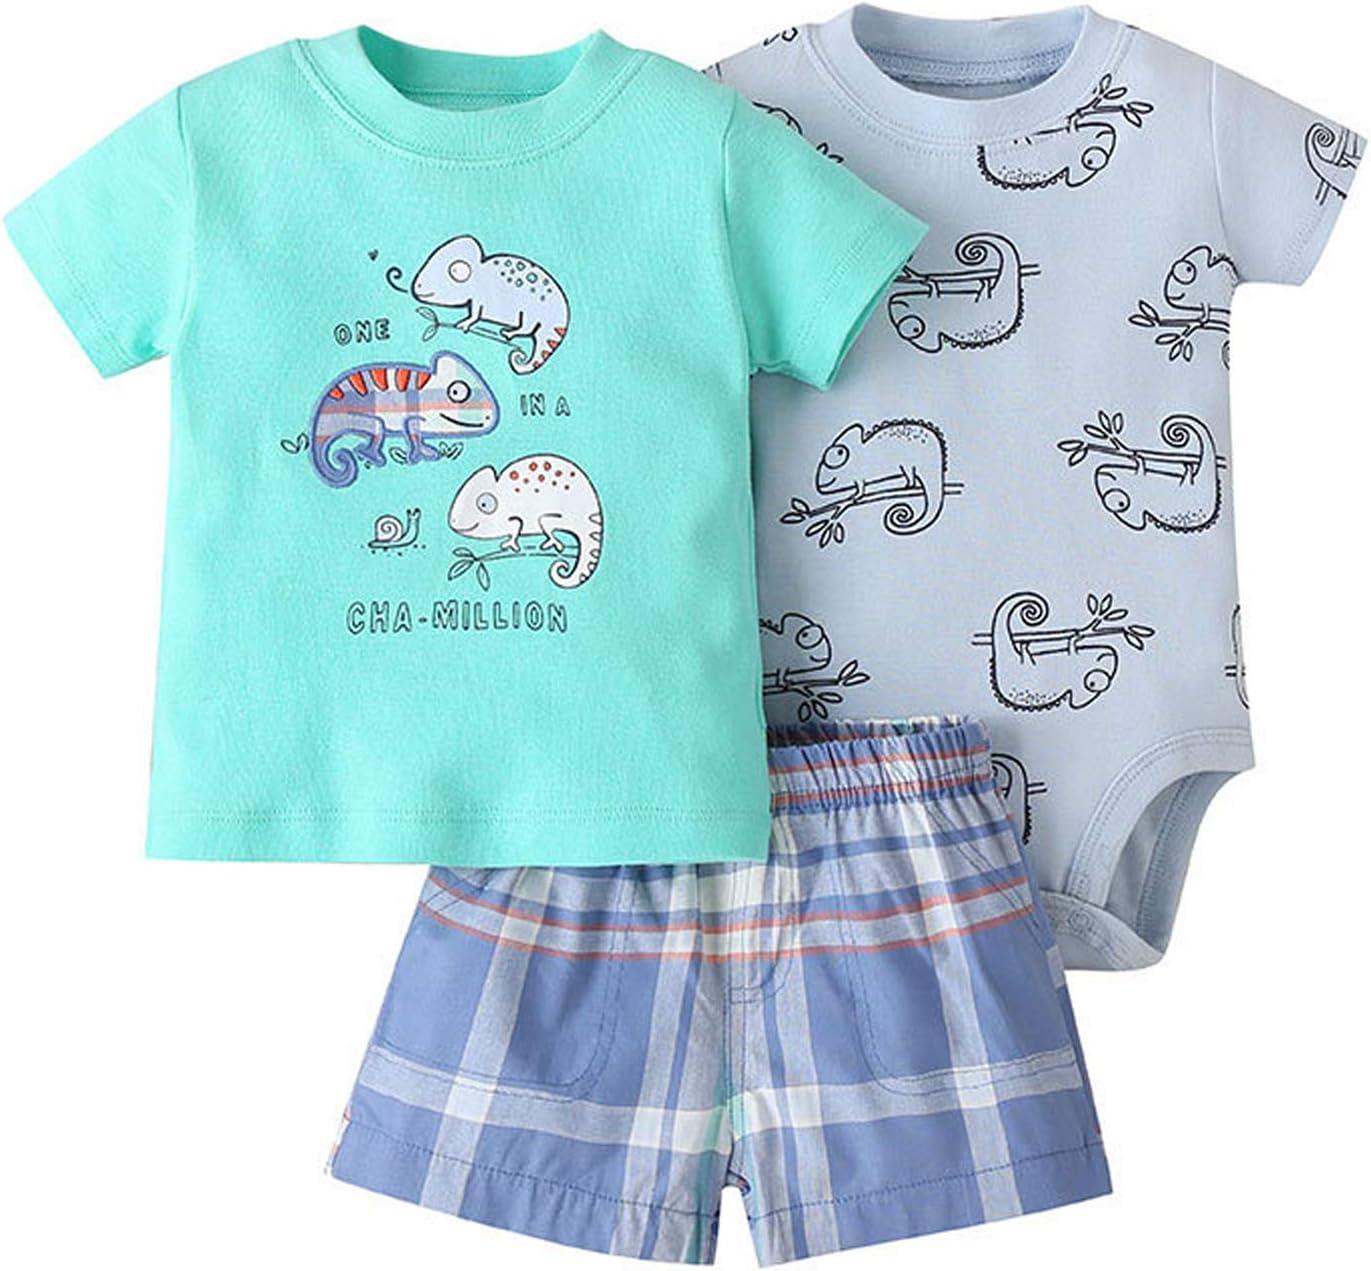 Bebé Ropa Mamelucos + Camiseta + Pantalón 3Pcs Trajes, Peleles Manga Corta Algodón Monos Recién Nacido Regalo Verano Niños Niñas 6-9 meses